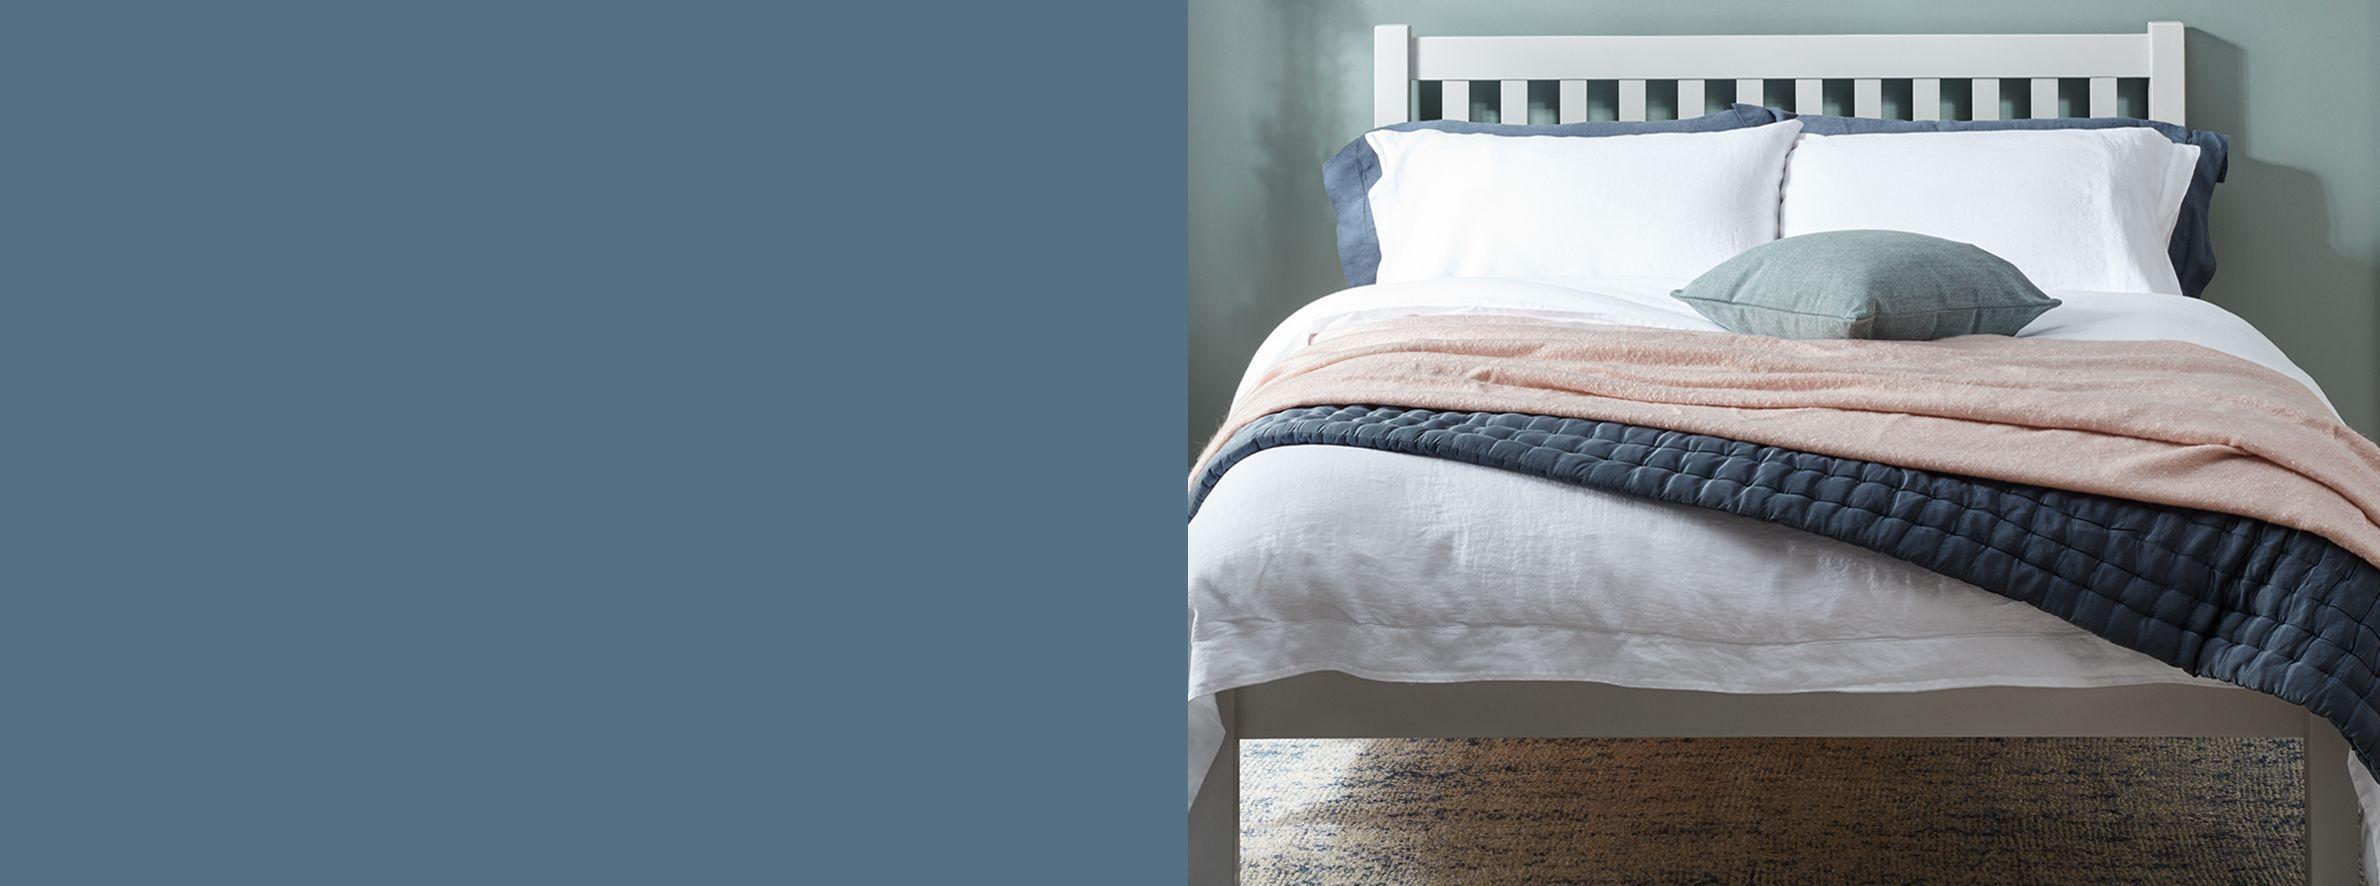 Satin bedding - a guarantee of good sleep